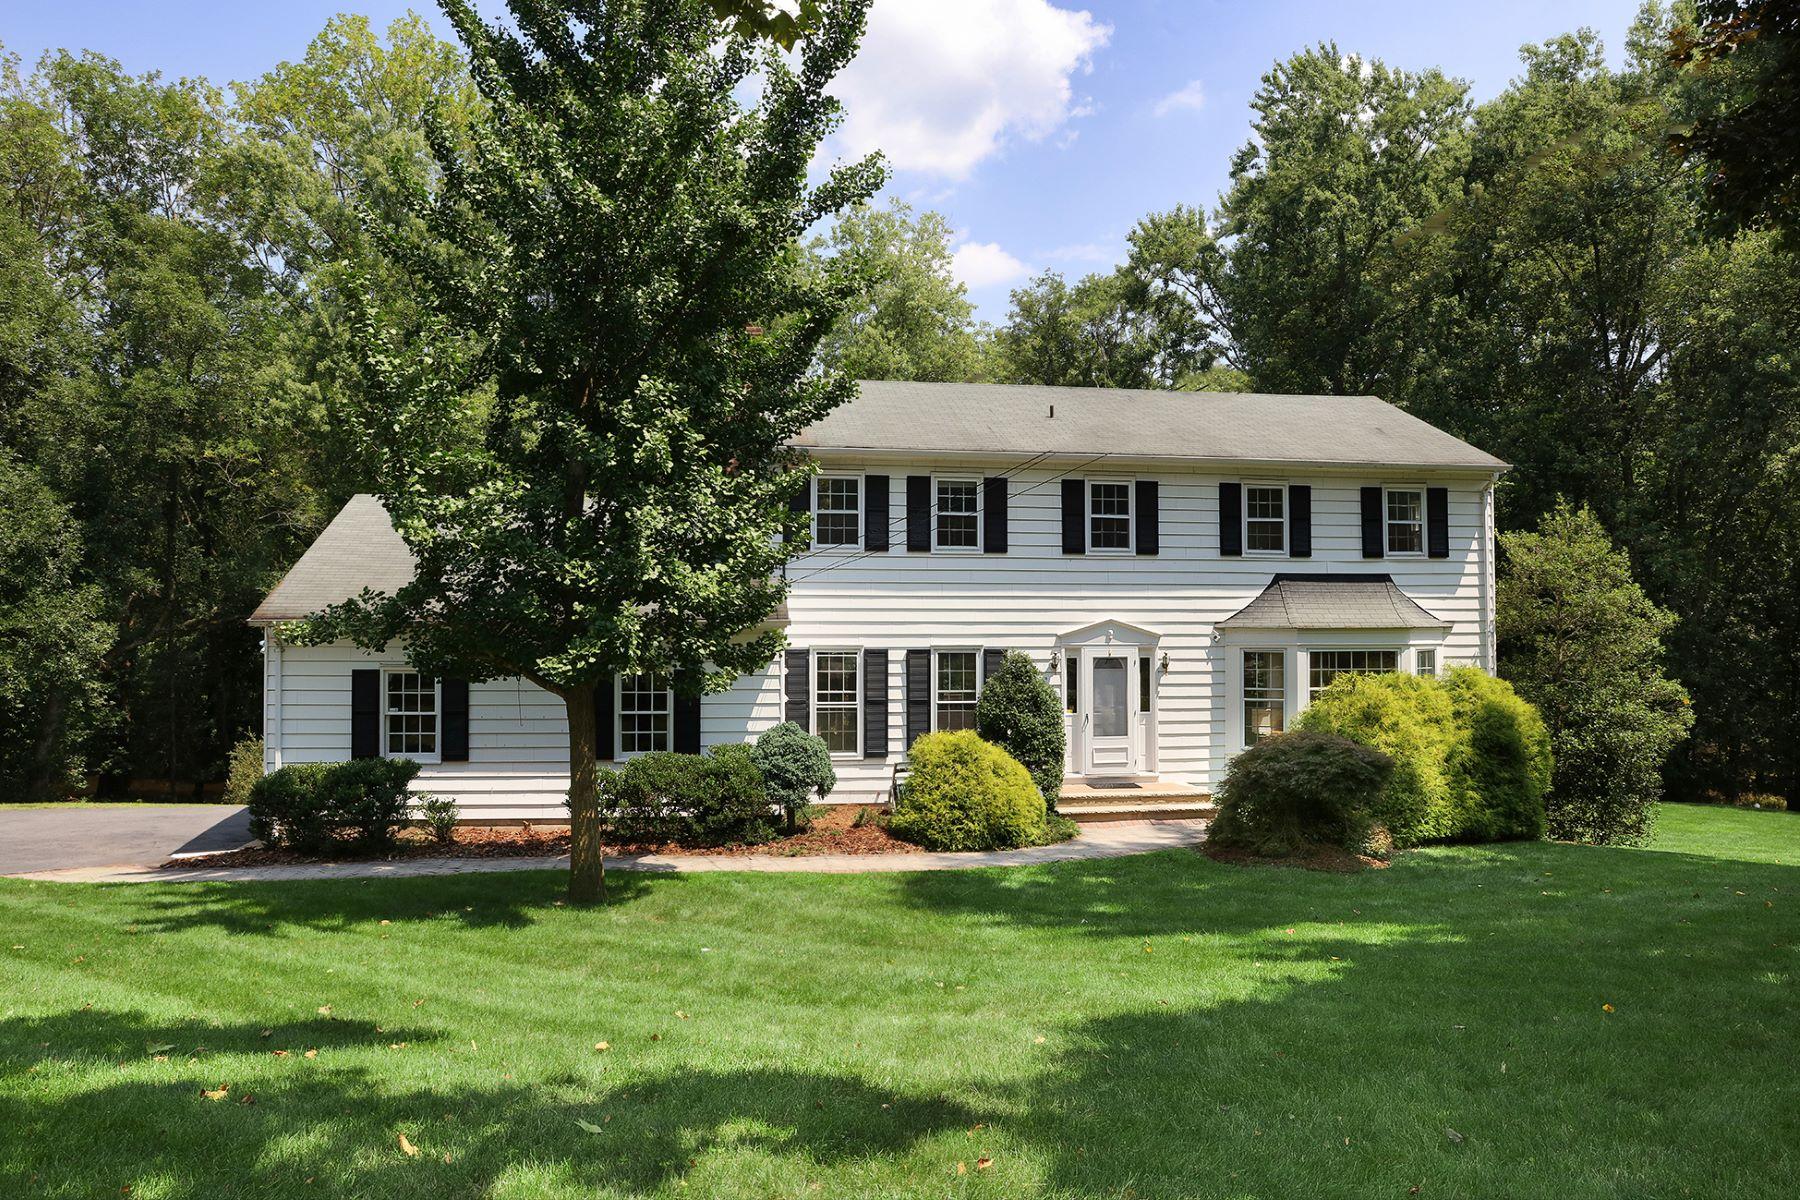 獨棟家庭住宅 為 出售 在 A Home That Celebrates Nature 32 Cleveland Circle, Skillman, 新澤西州 08558 美國在/周邊: Montgomery Township